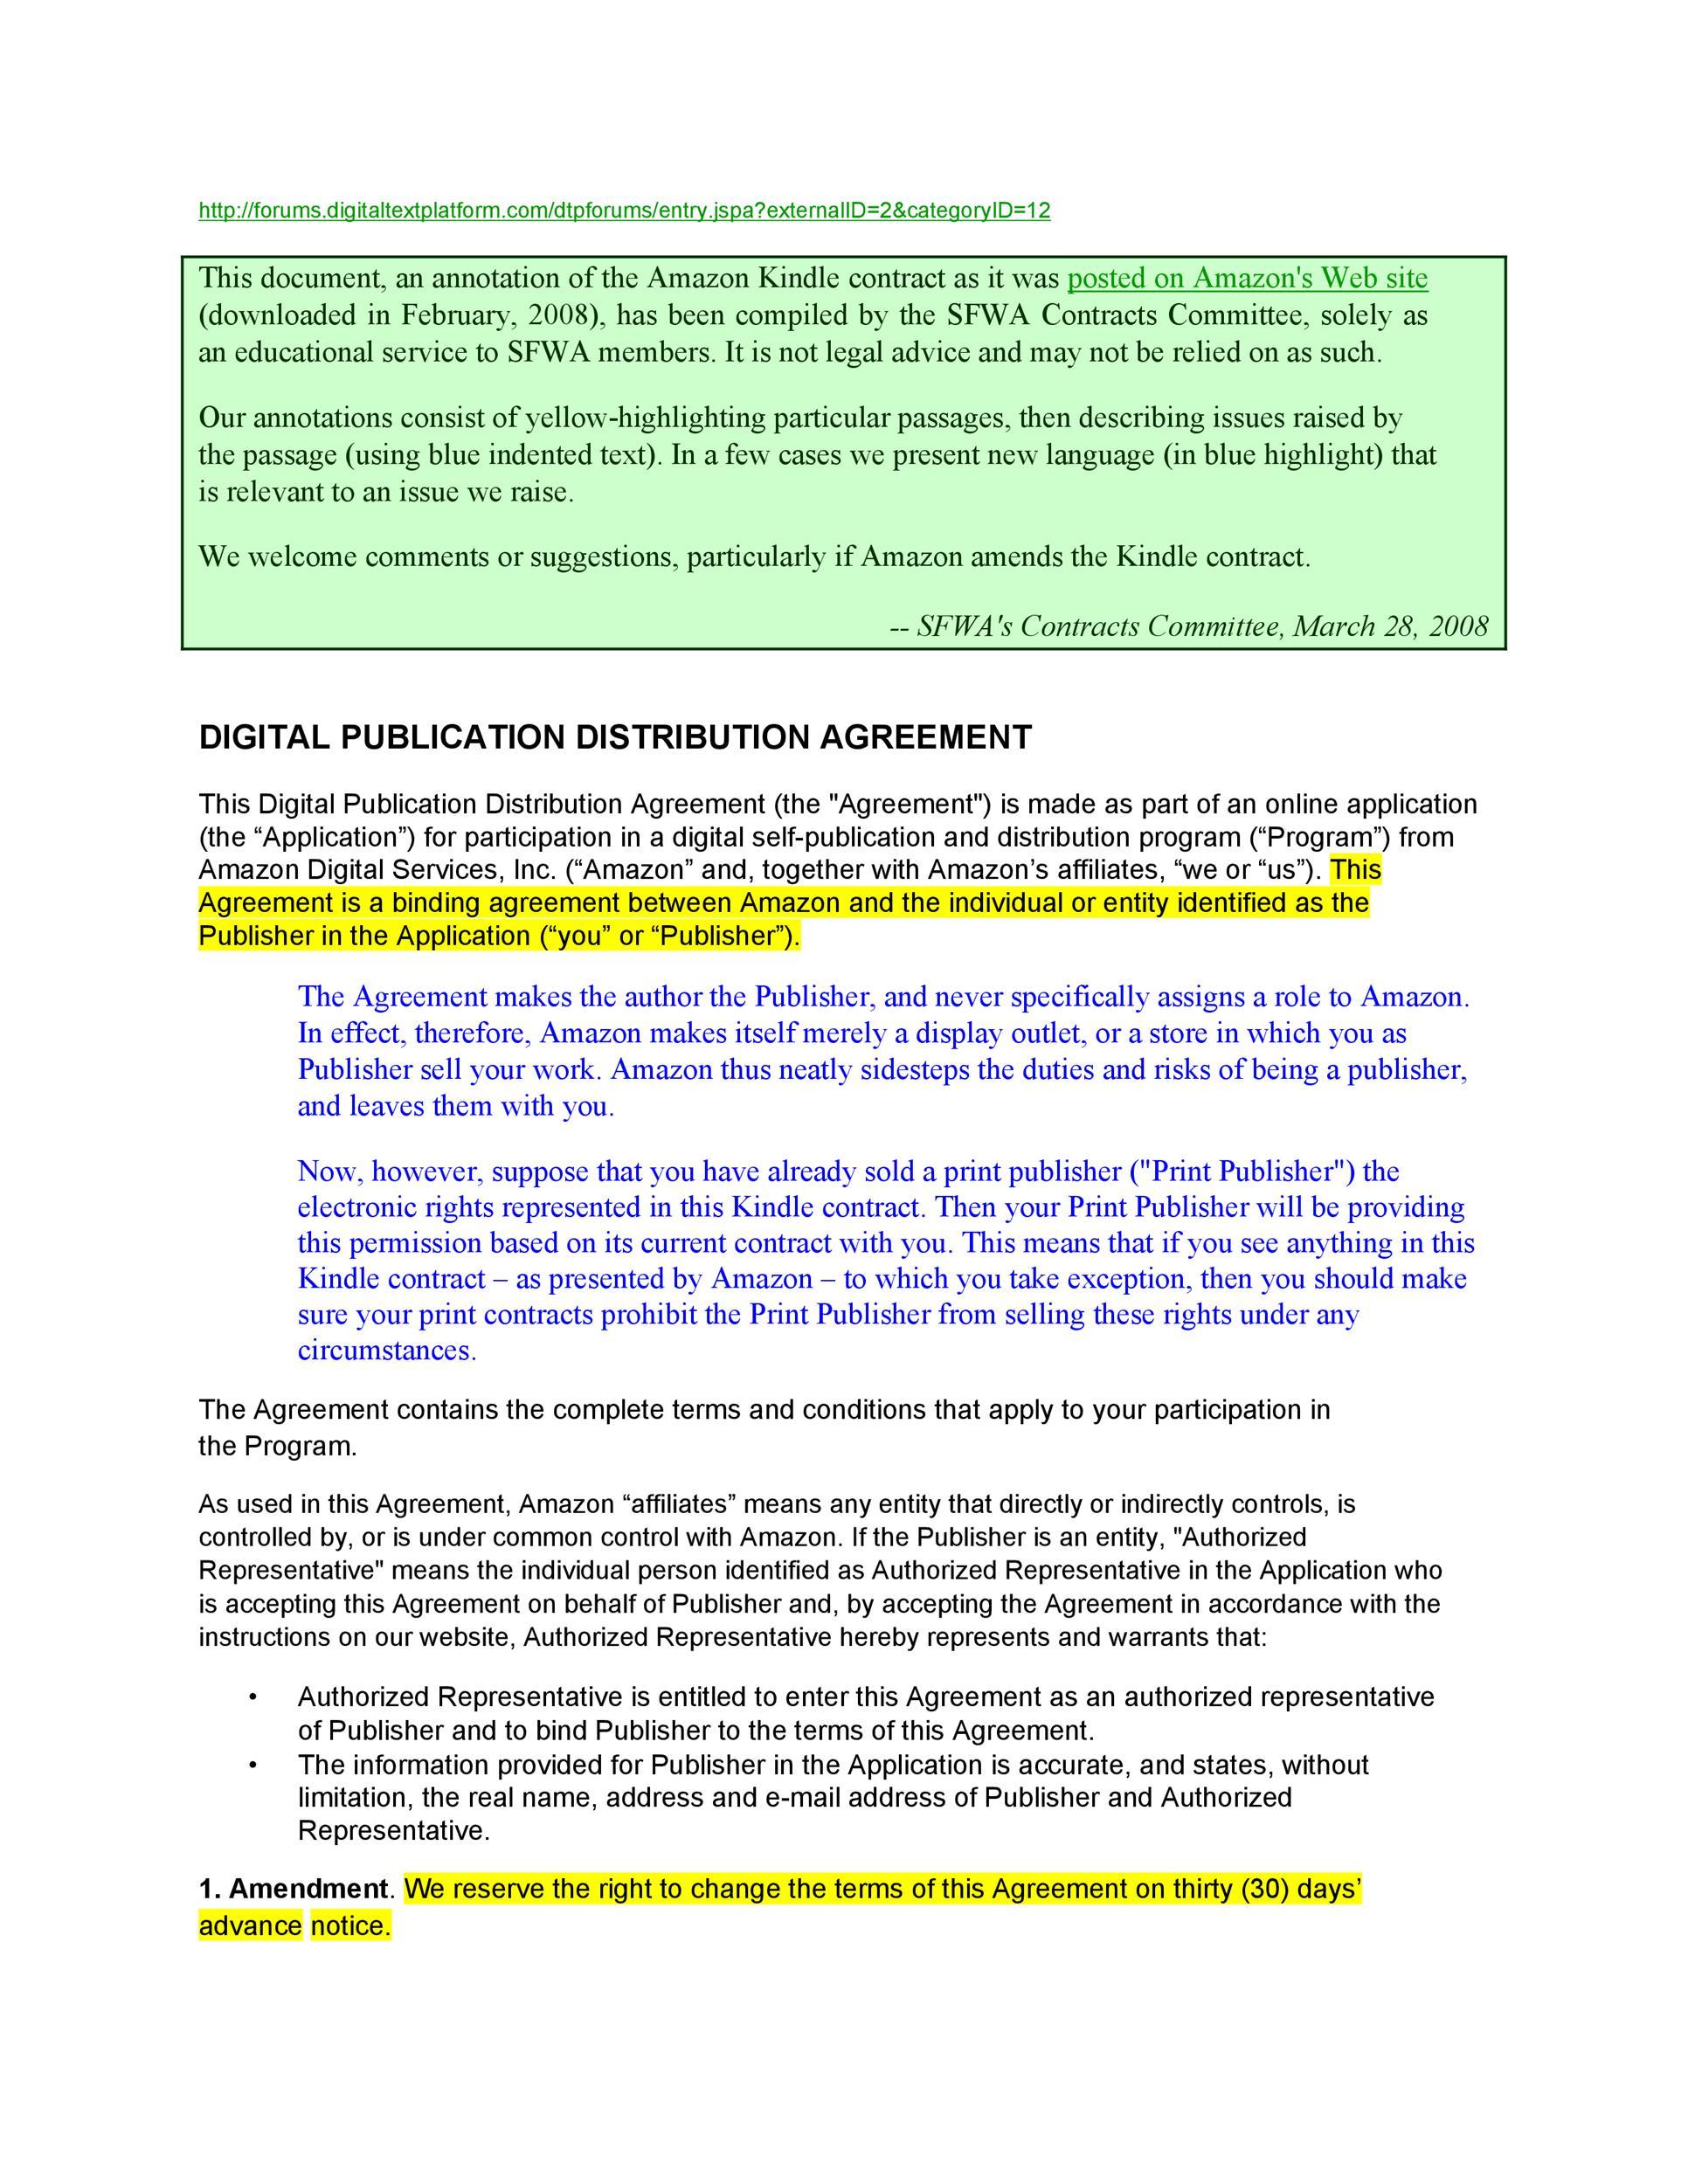 Free distribution agreement 48